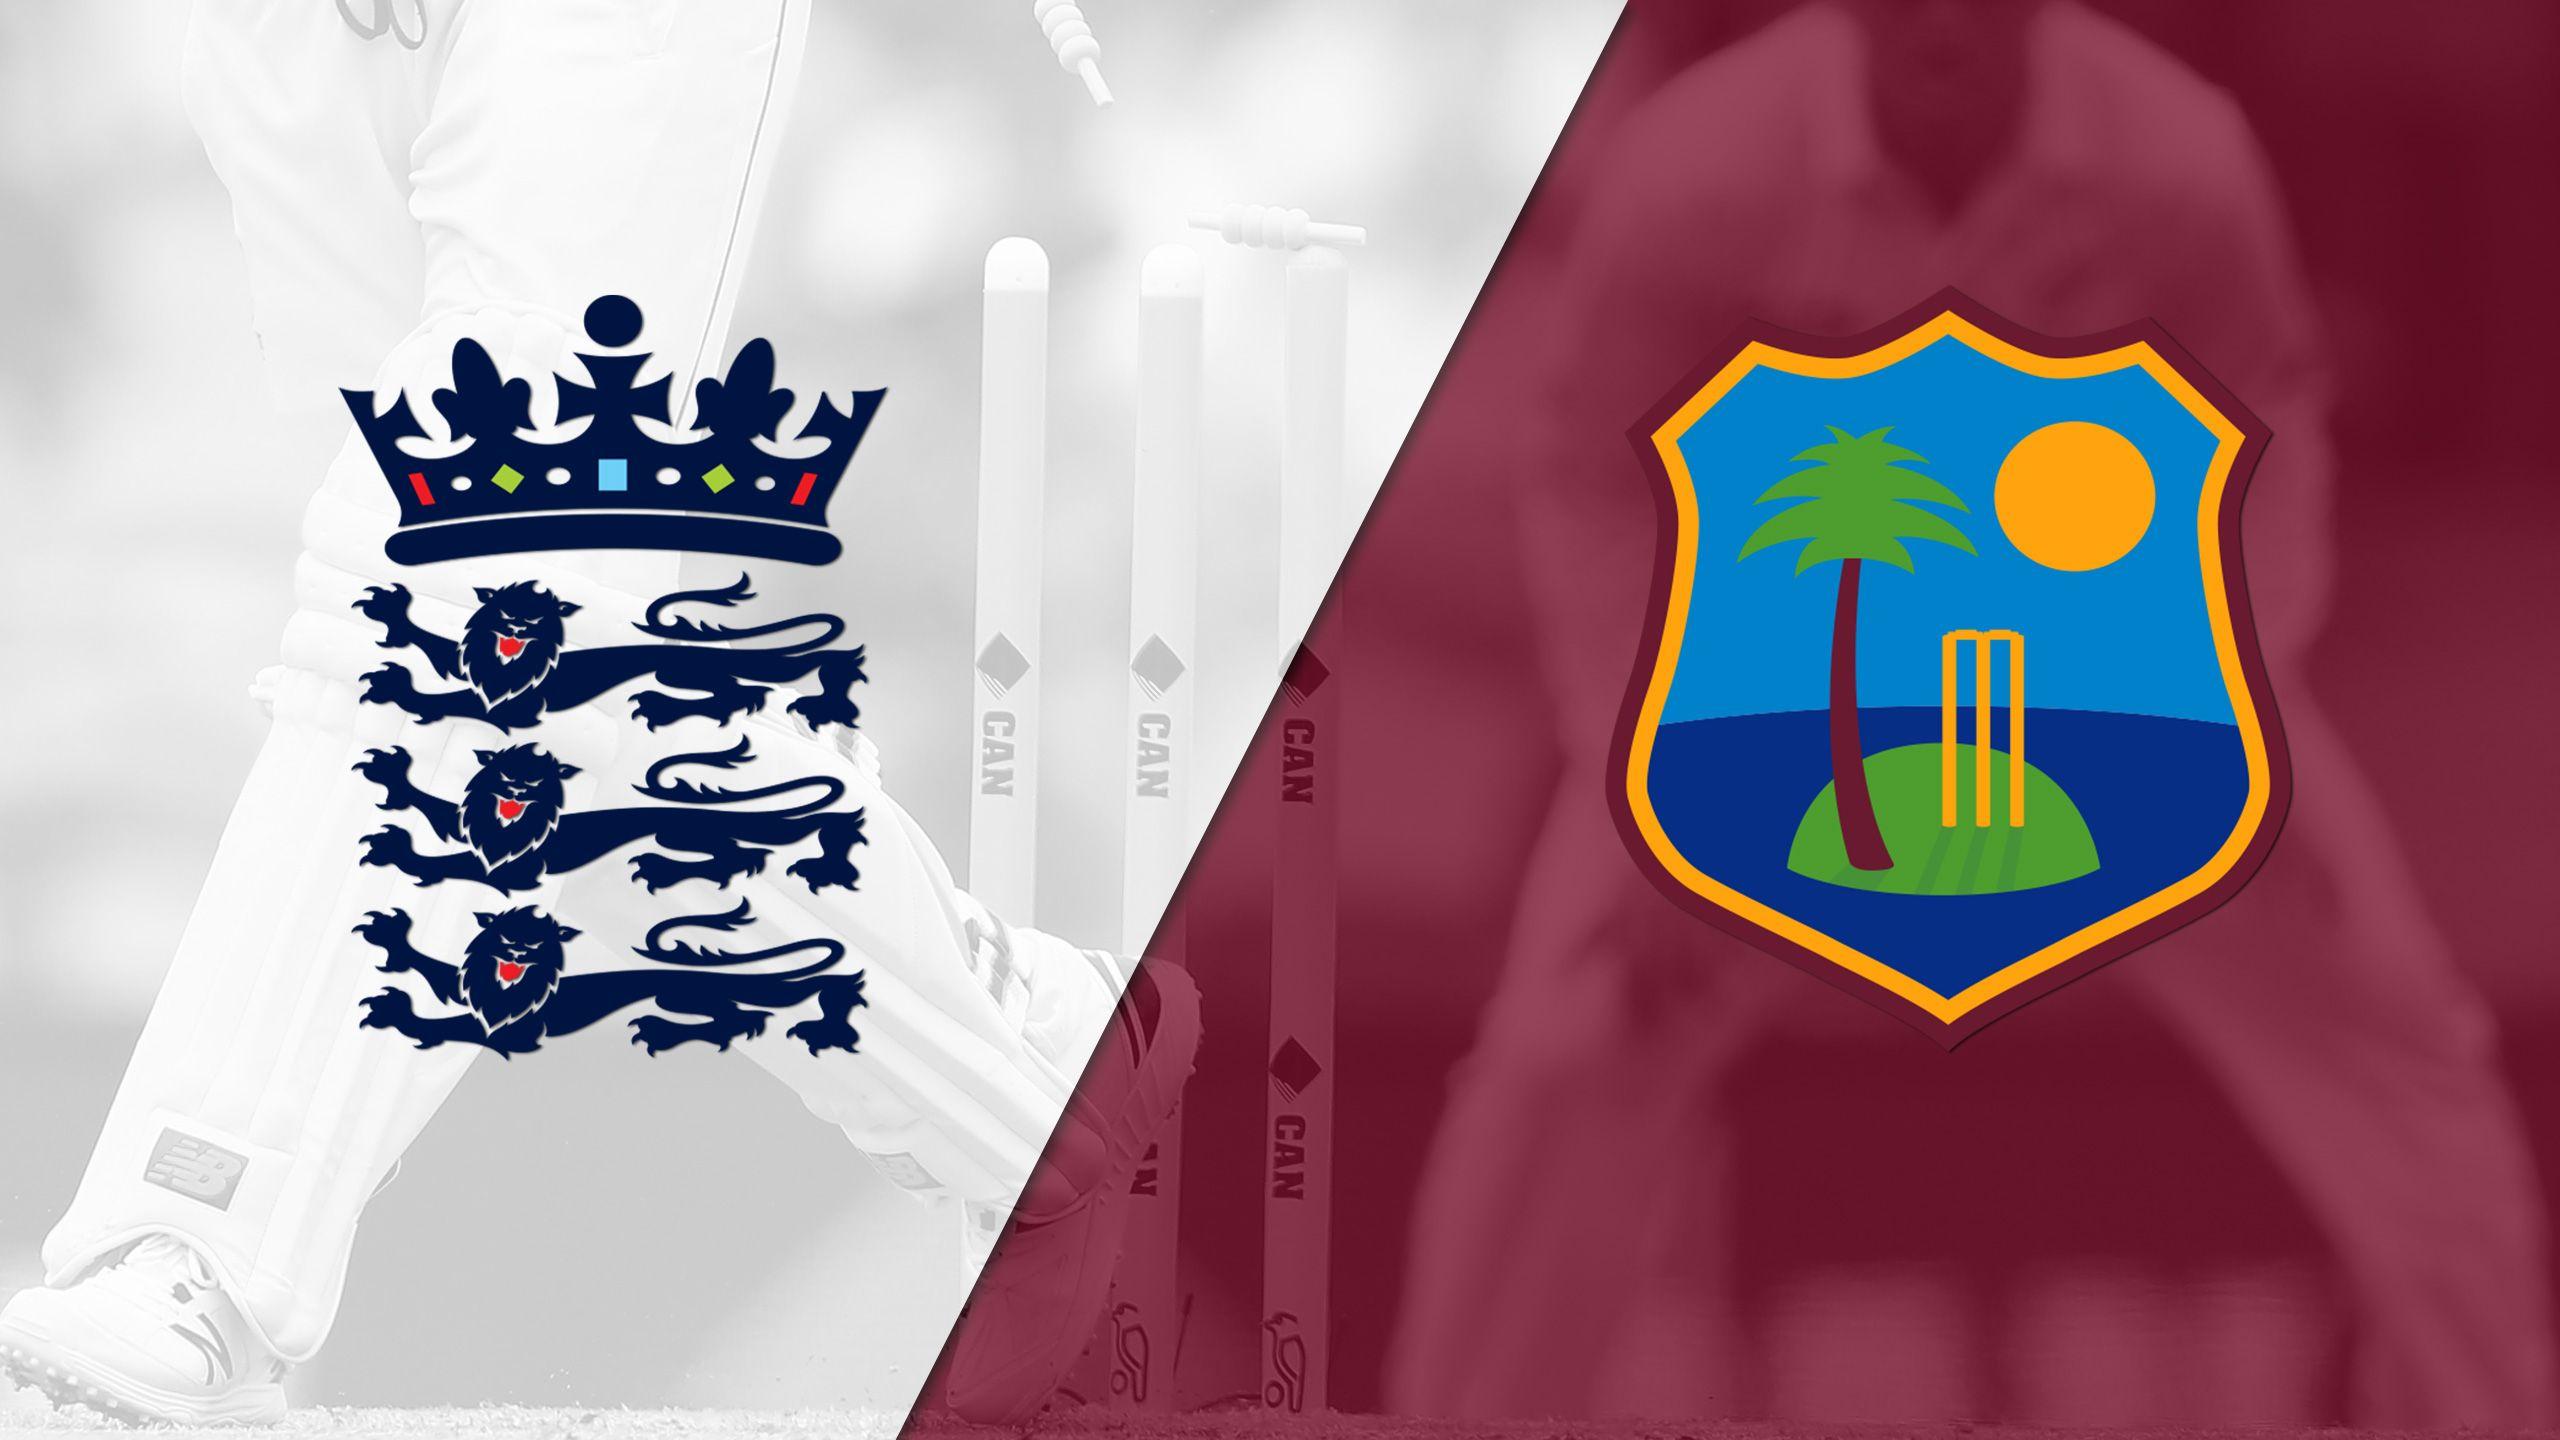 England vs. West Indies (Test 1, Day 3) (International Cricket)